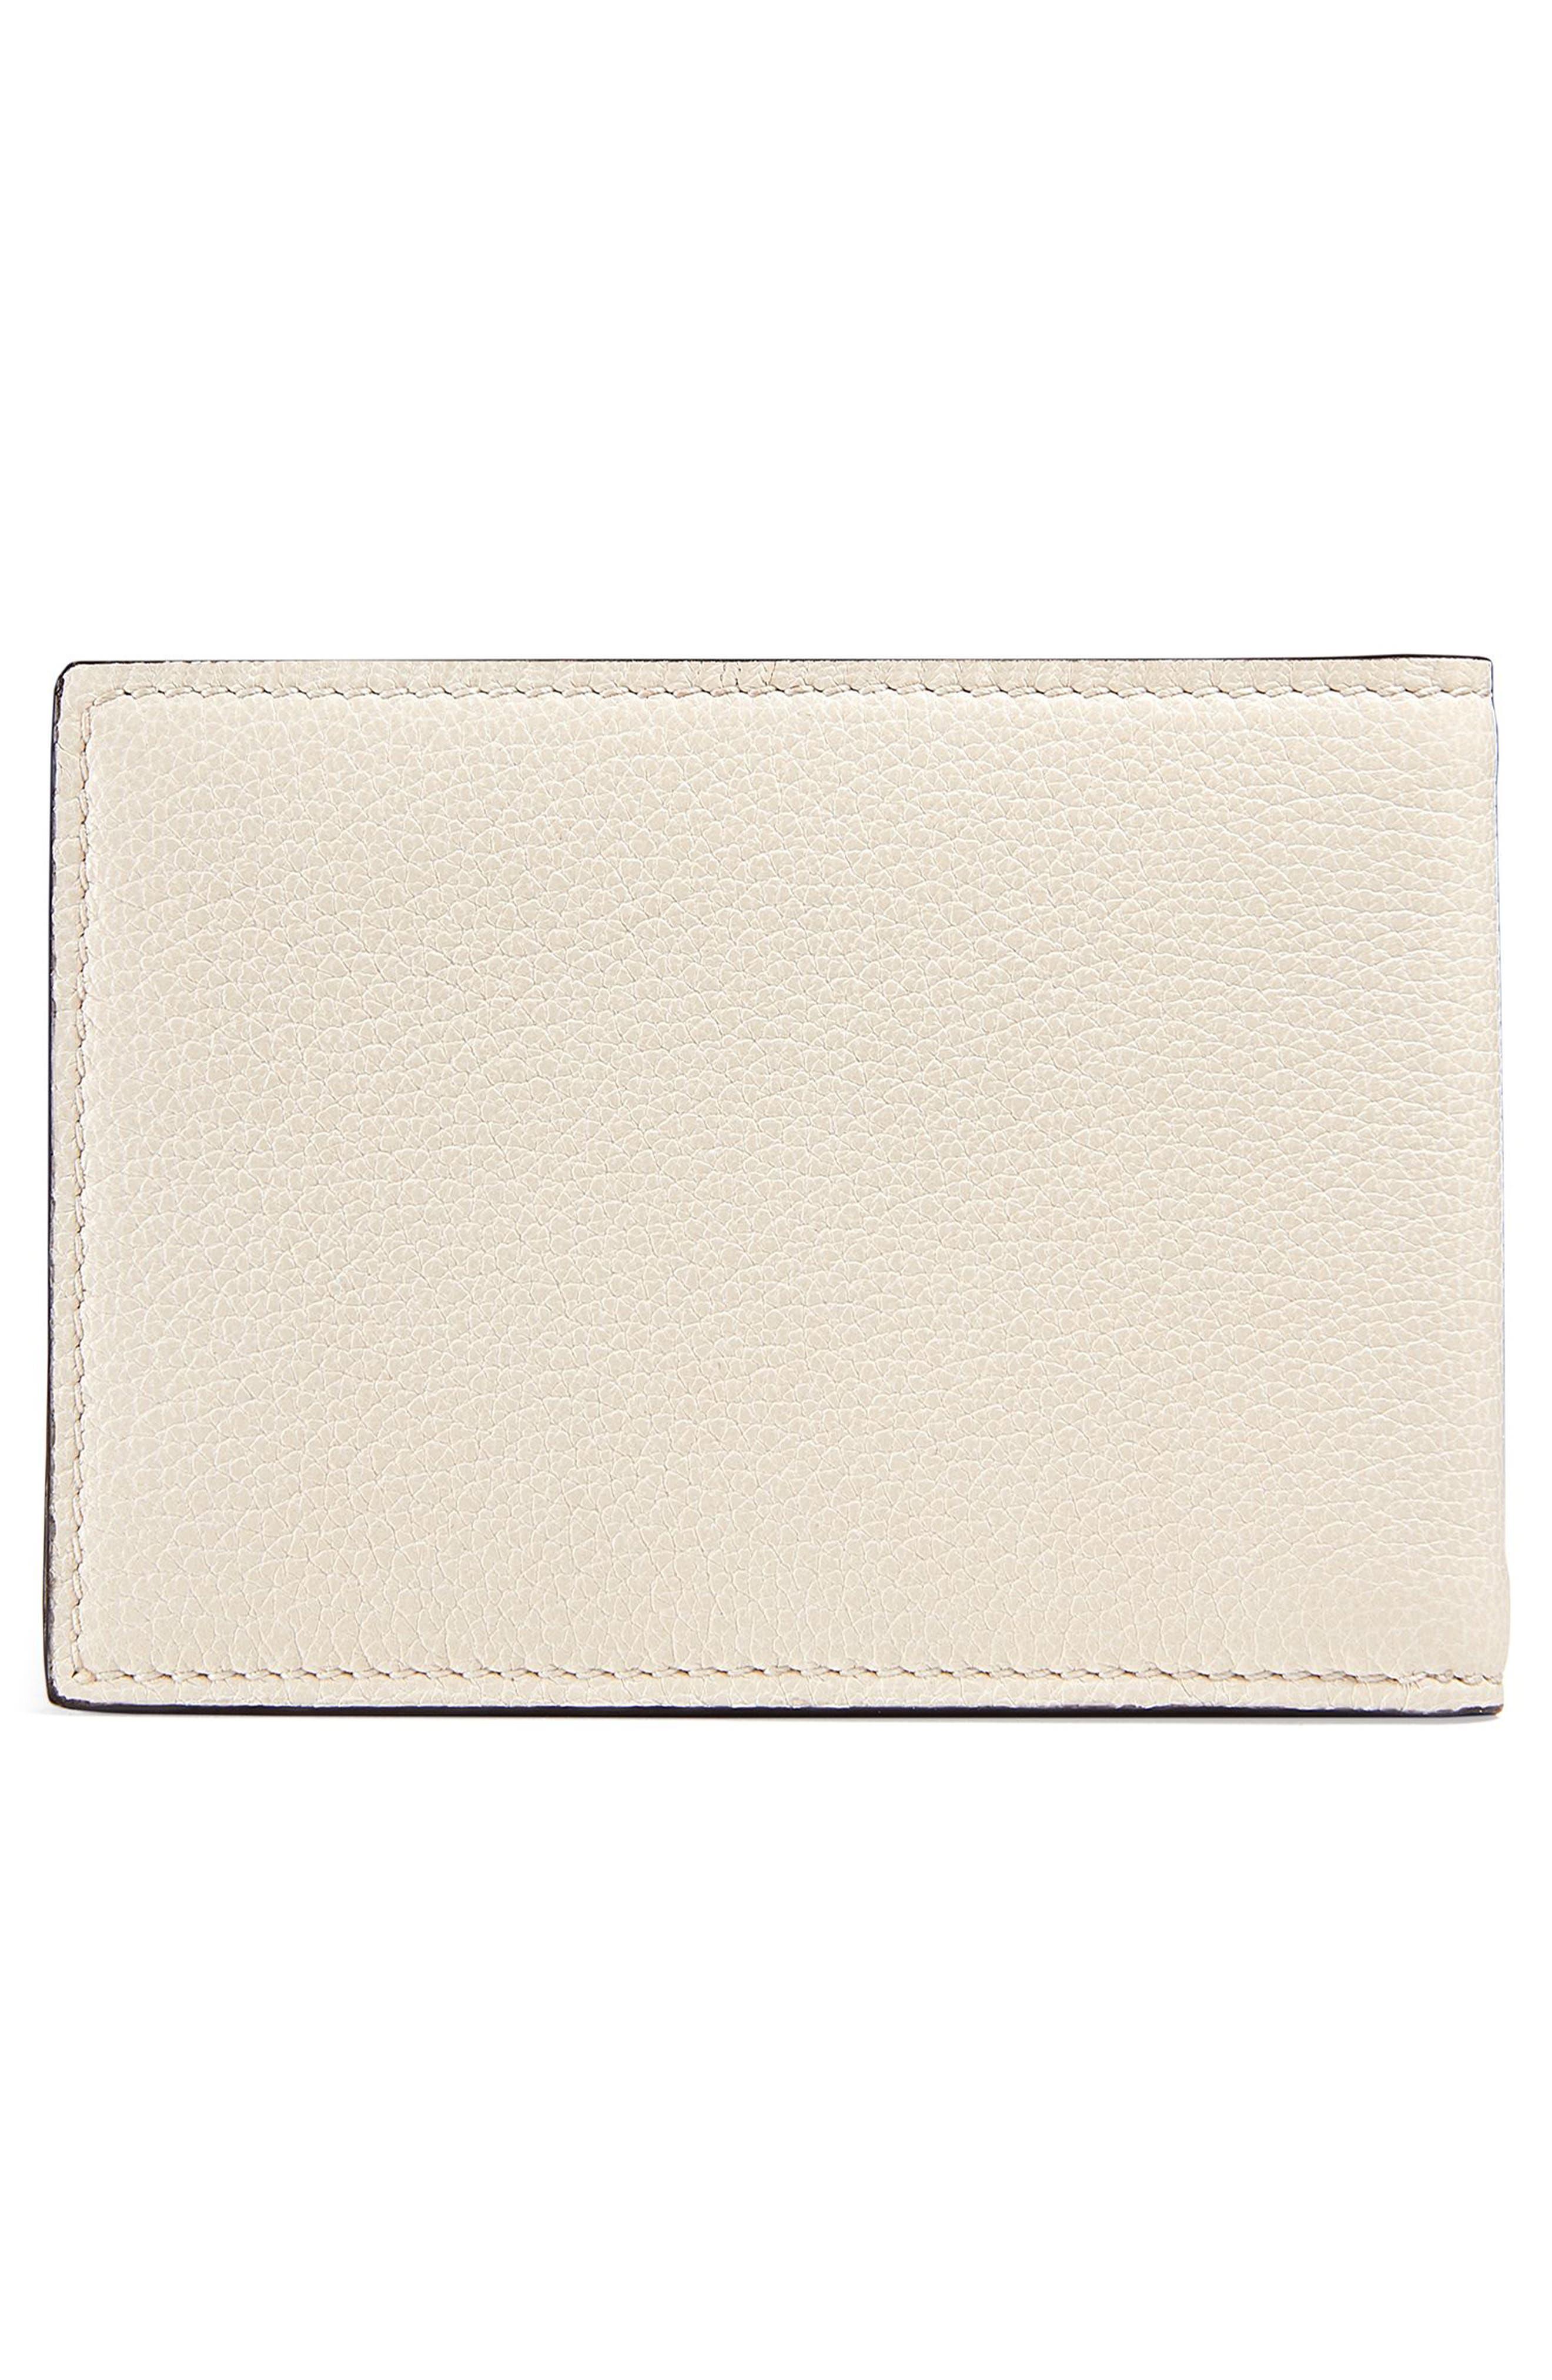 Alternate Image 3  - Gucci Wallet